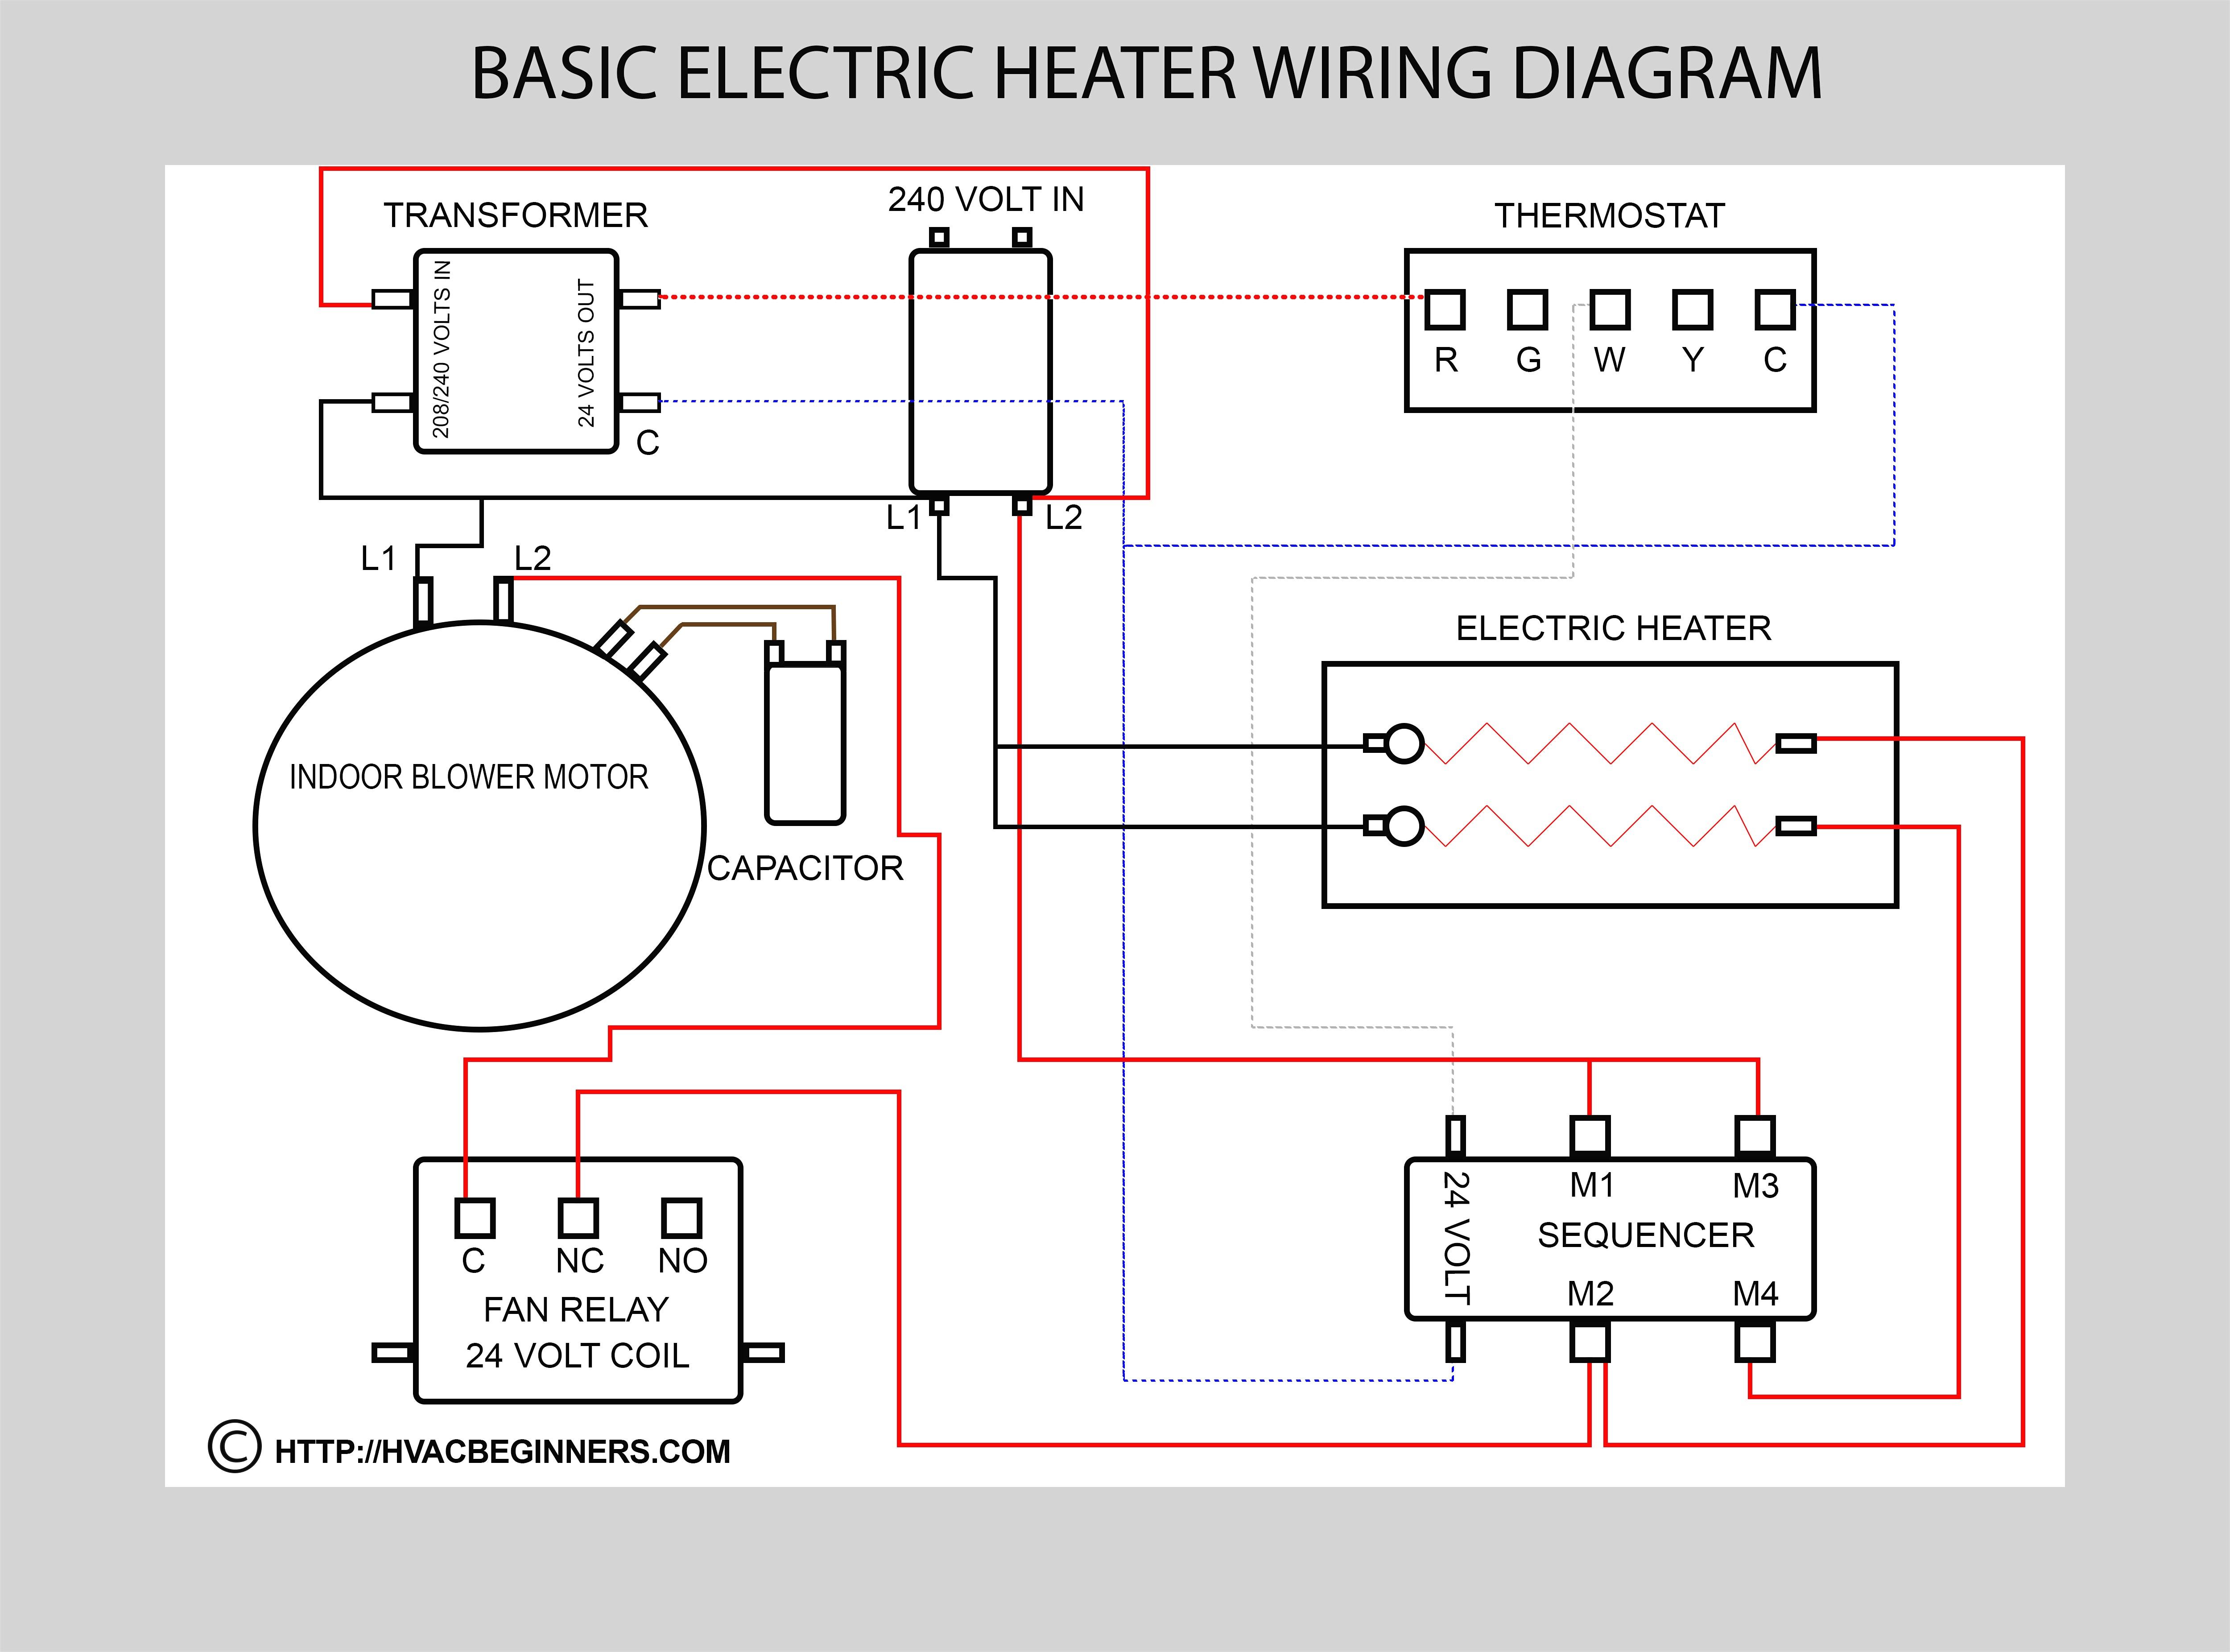 Ac Wiring Diagram - Wiring Diagrams Hubs - 220 Volt Air Compressor Wiring Diagram